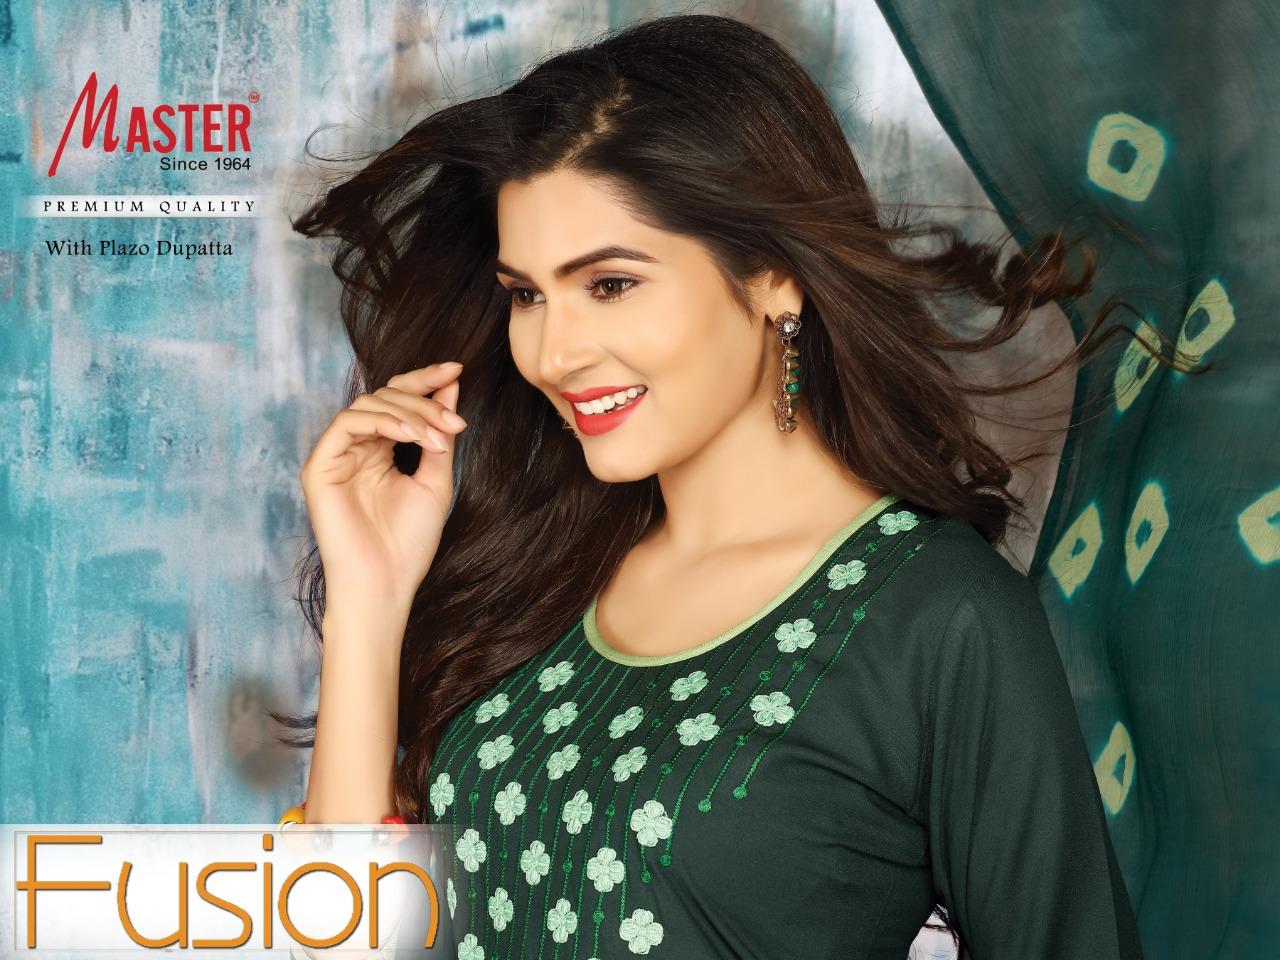 Master fusion latest kurti plazzo dupatta edition at wholesale rate